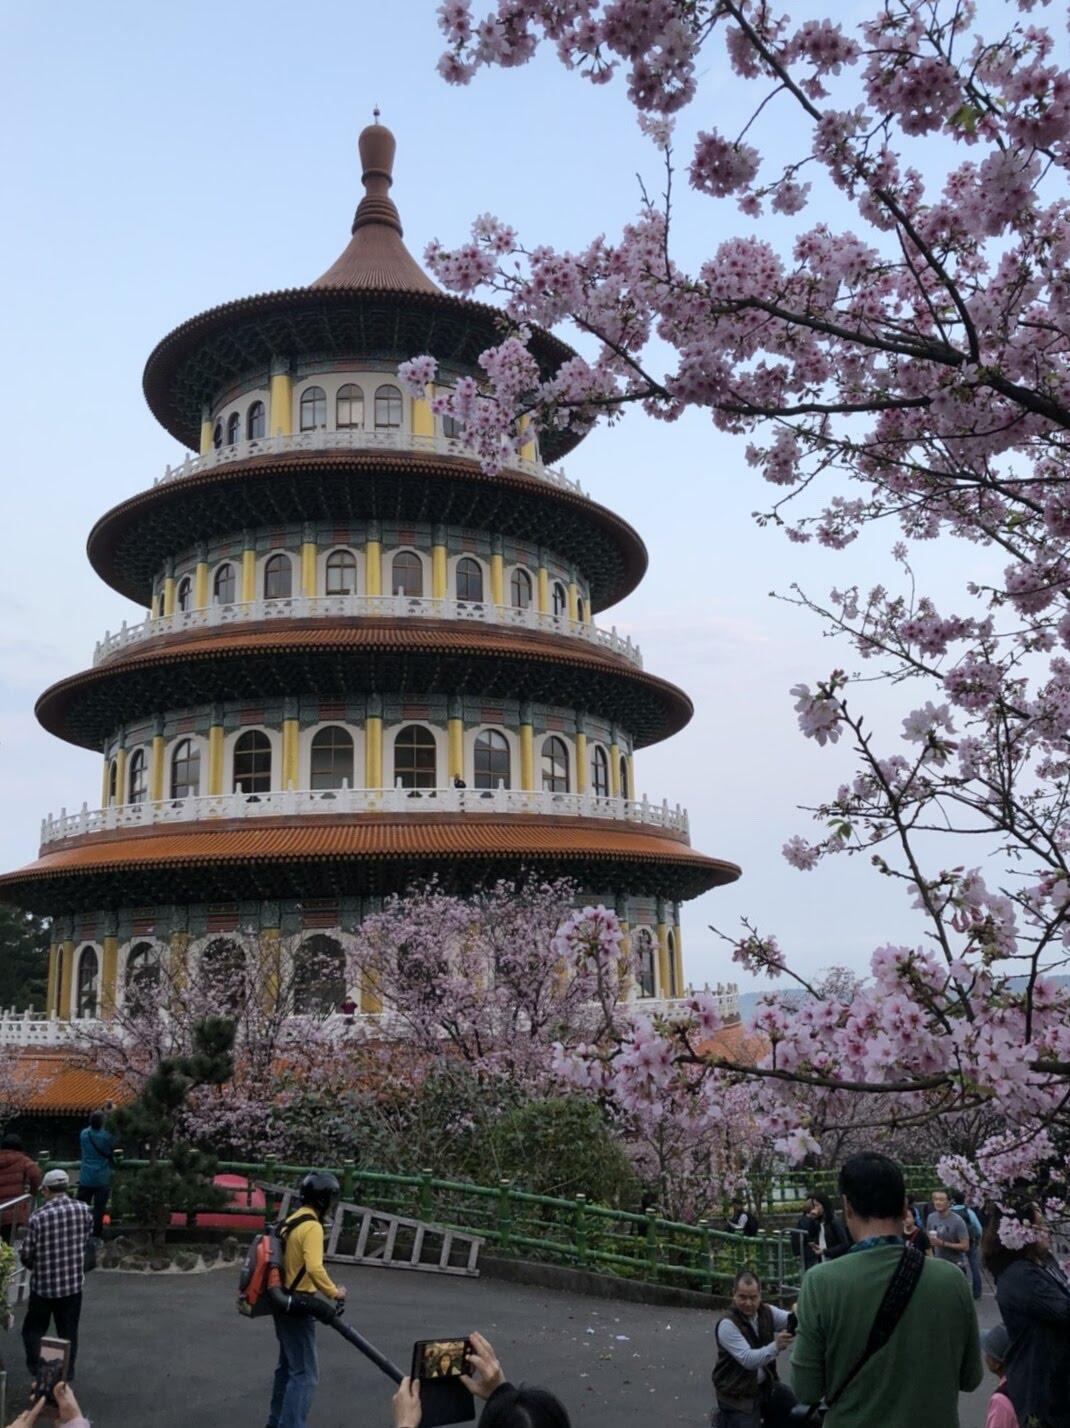 tienyuan09 淡水-晨光中綻放的櫻花 北台灣最夯賞櫻景點天元宮